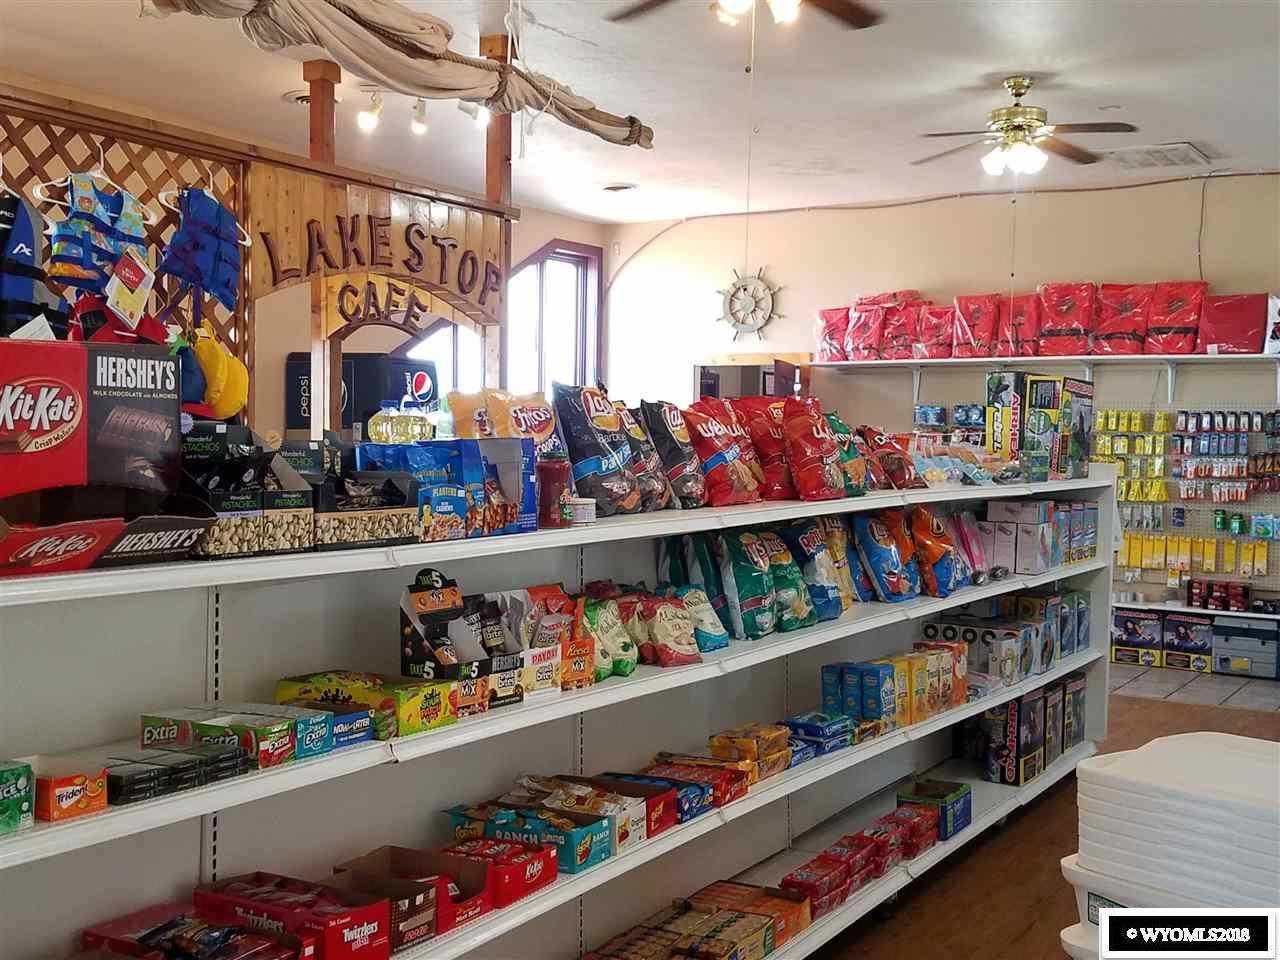 Lake Stop Resort - Convenience Store